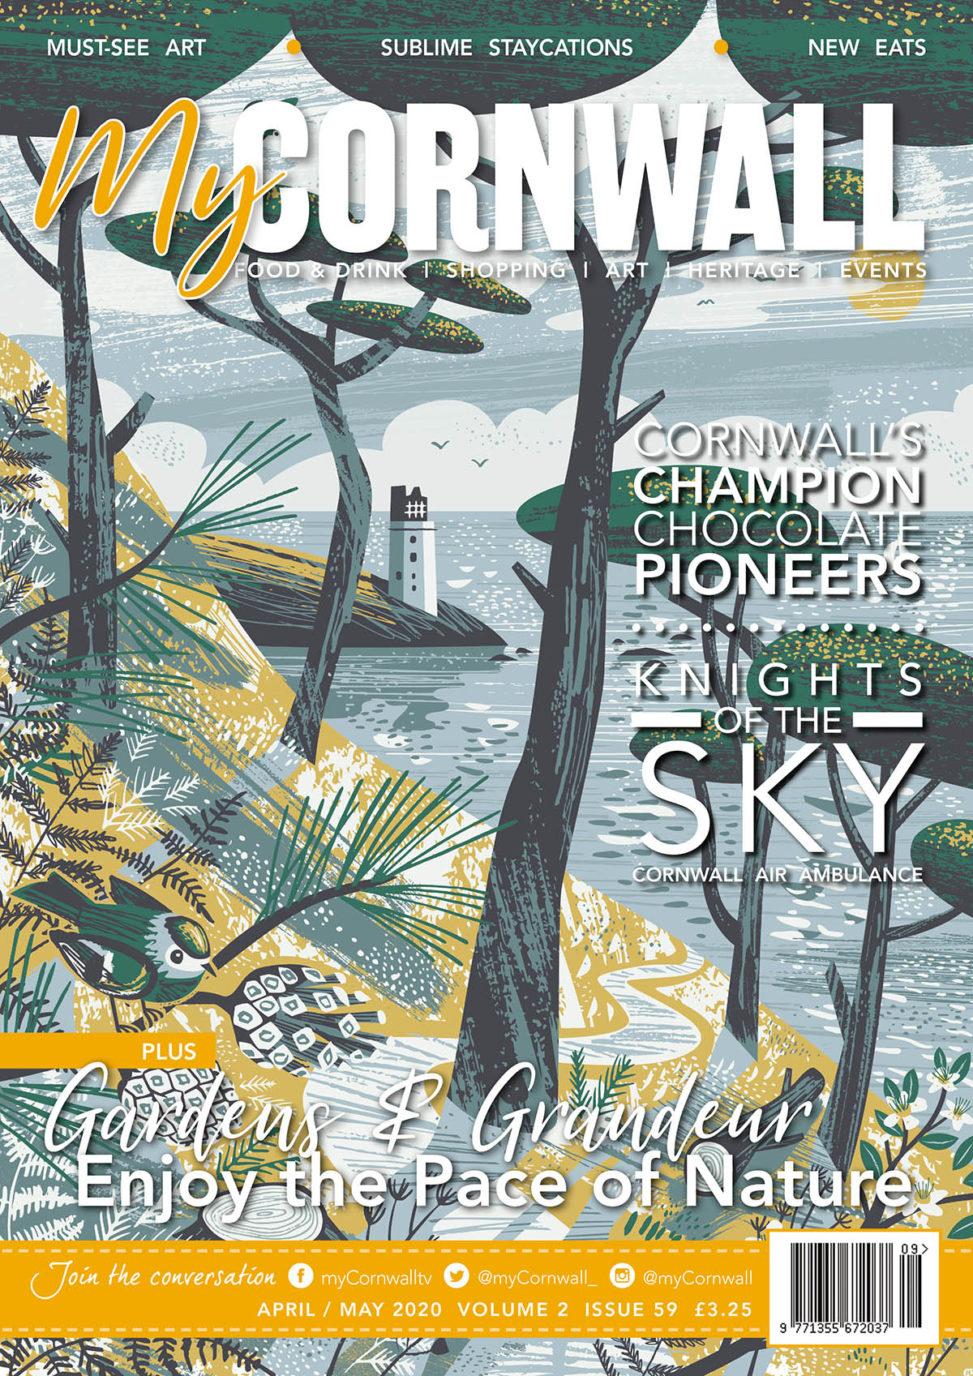 MyCornwall Magazine Cover April 2020 with St Anthony Lighthouse illustration by Matt Johnson